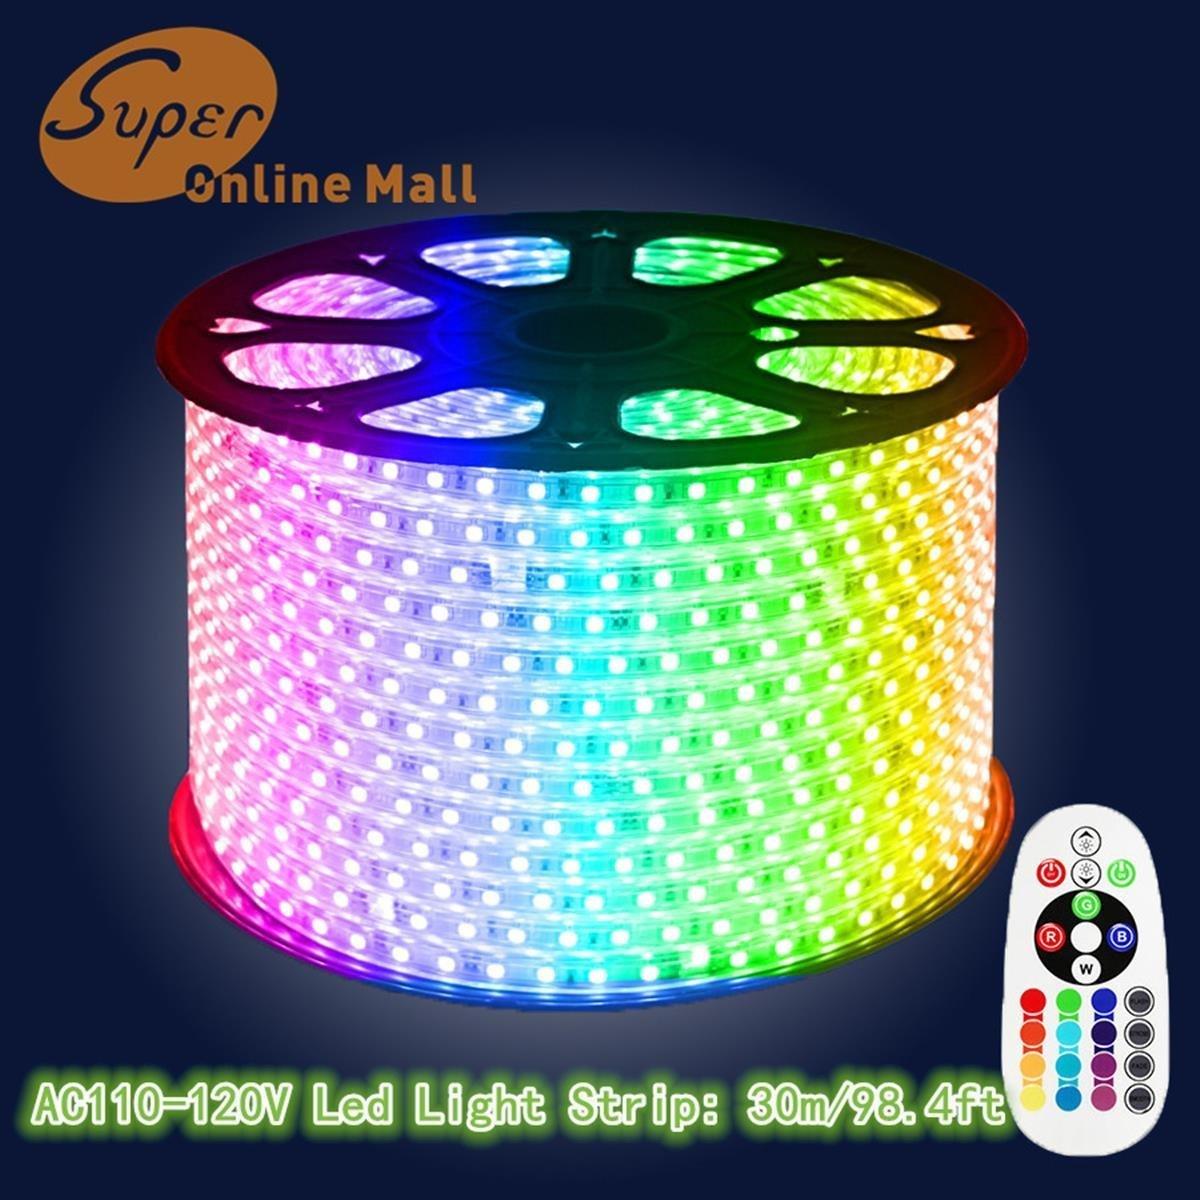 SuperonlineMall AC 110-120V Flexible Waterproof LED Strip Lights, 30m/98.4ft - RGB